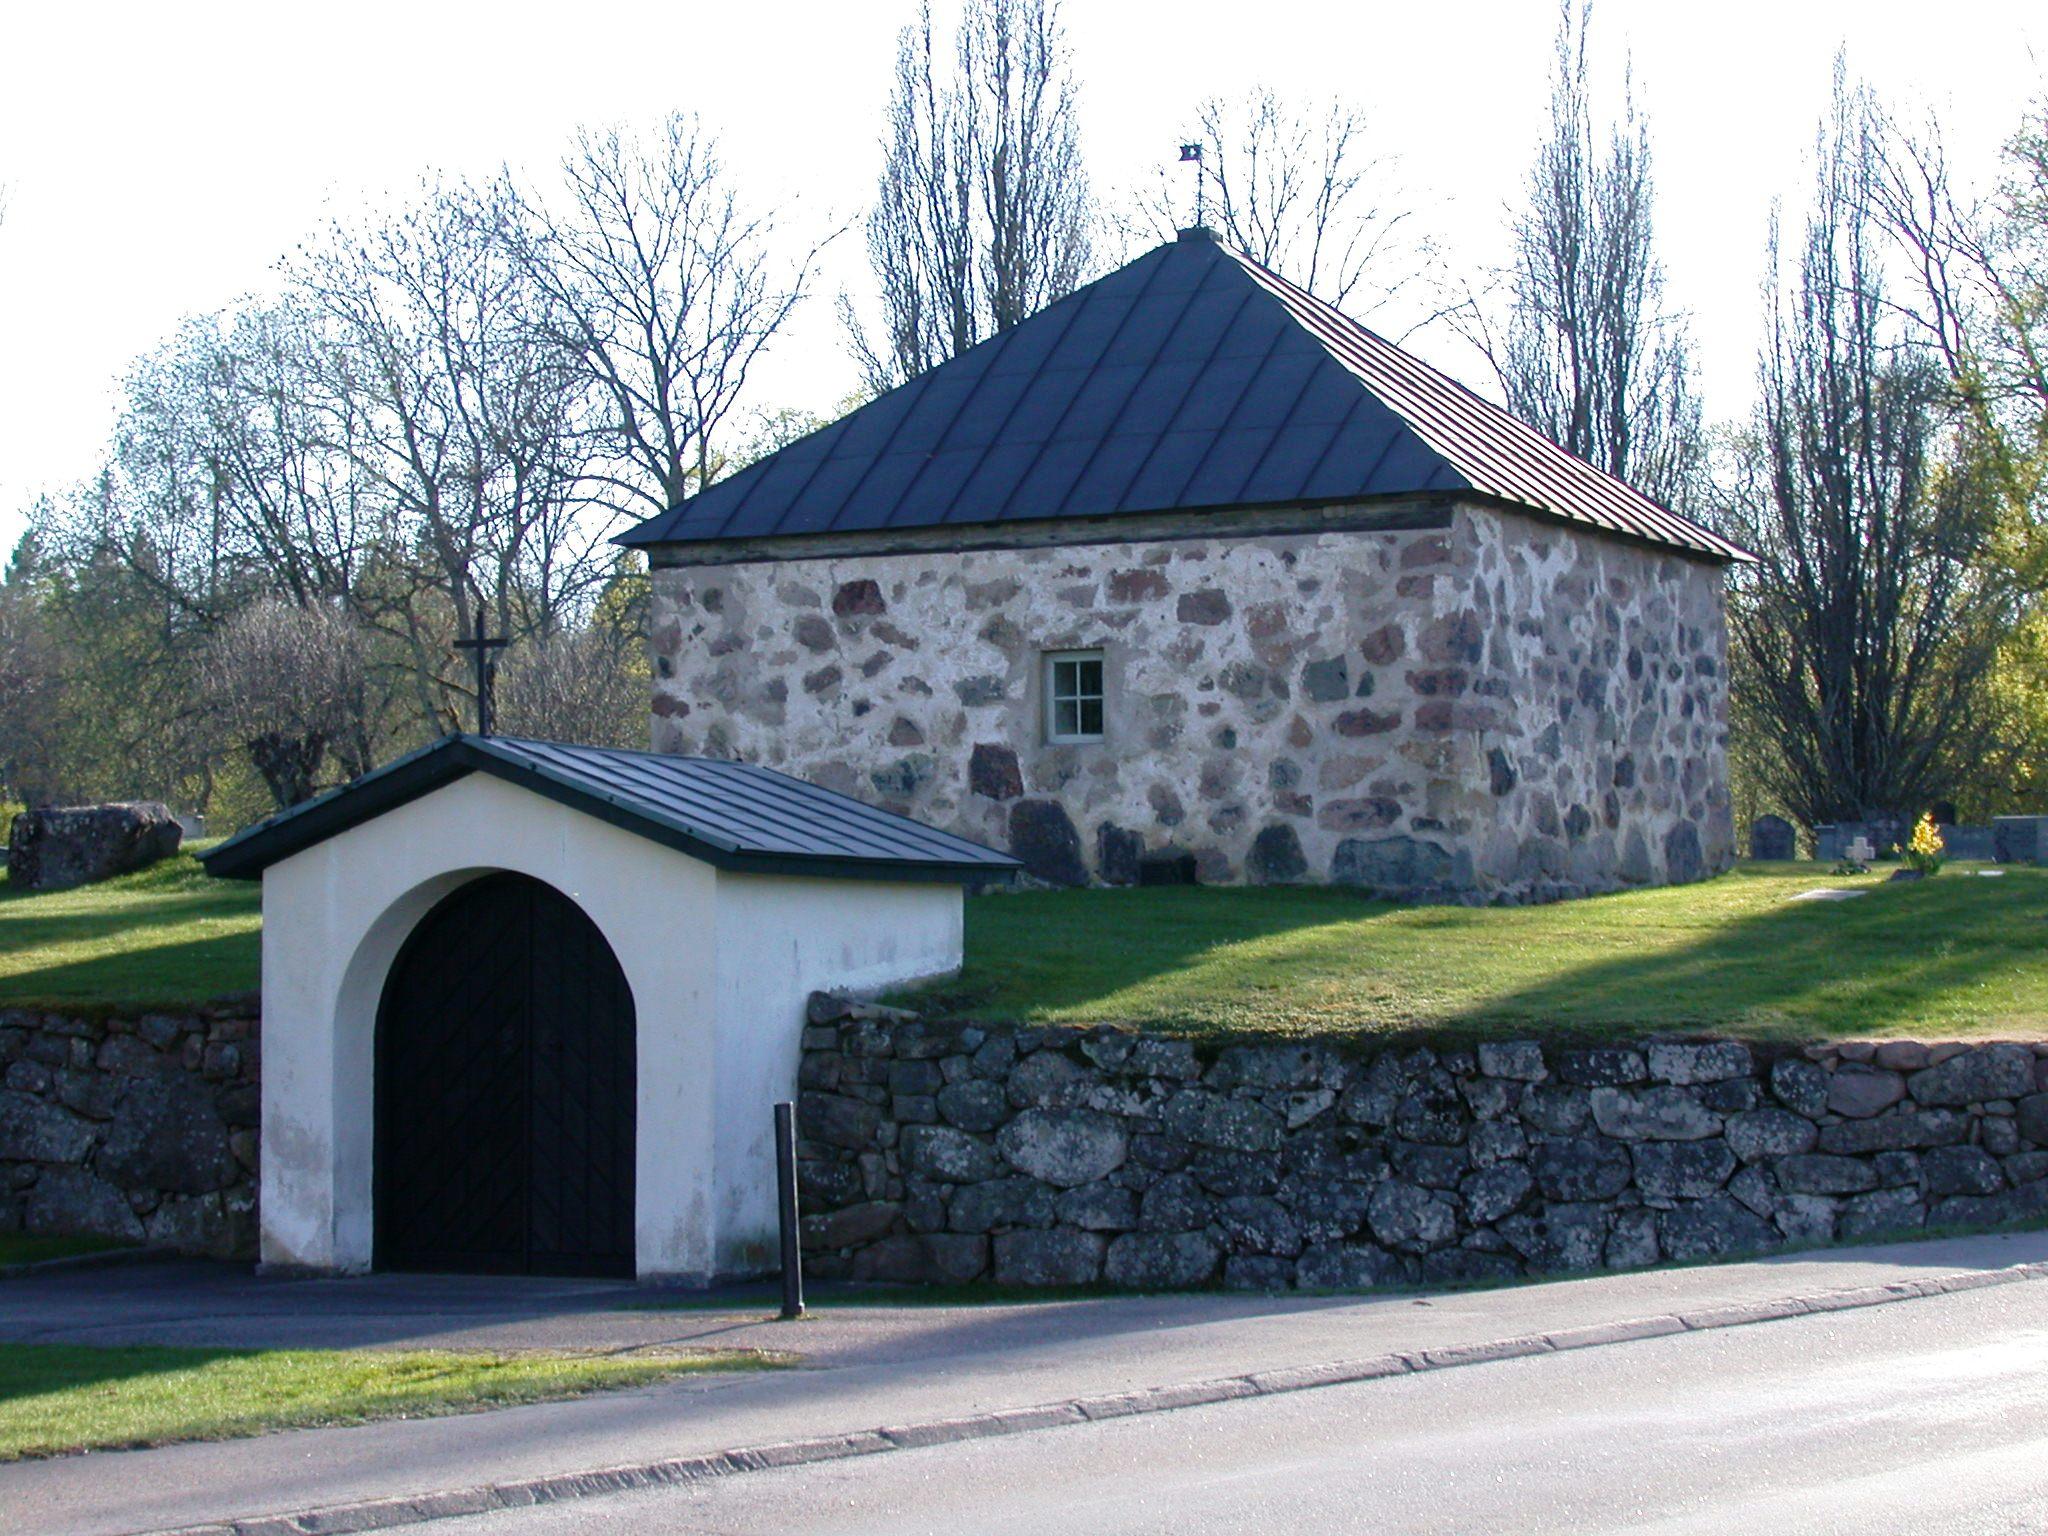 Fil:lghult church Uppvidinge Sweden hayeshitzemanfoundation.org Wikipedia